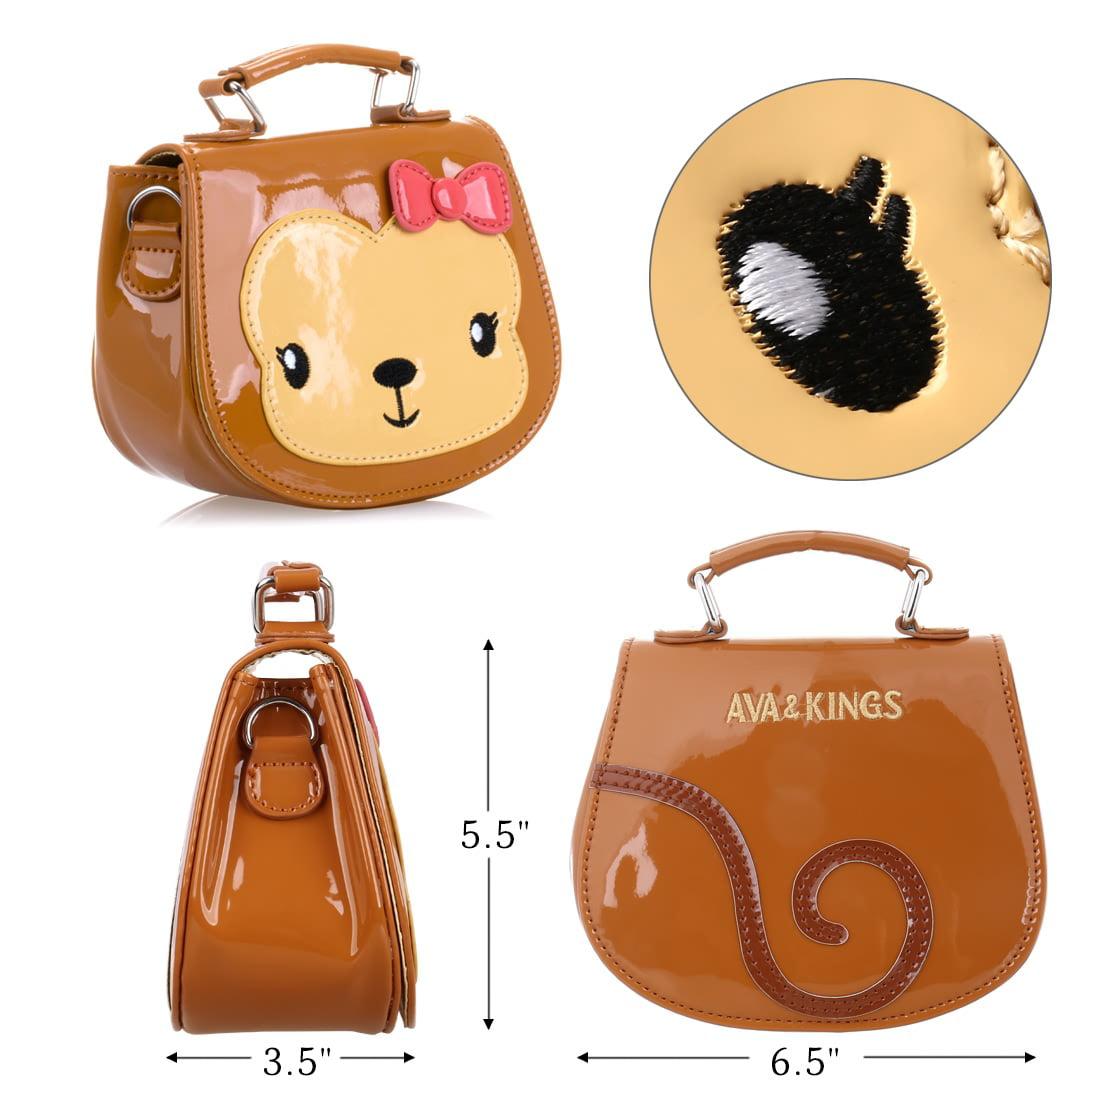 6fb58a4bffbe Ava   Kings - Ava   Kings Girls Purse Glossy PU Leather Animal Handbags  w Adjustable Strap - Walmart.com